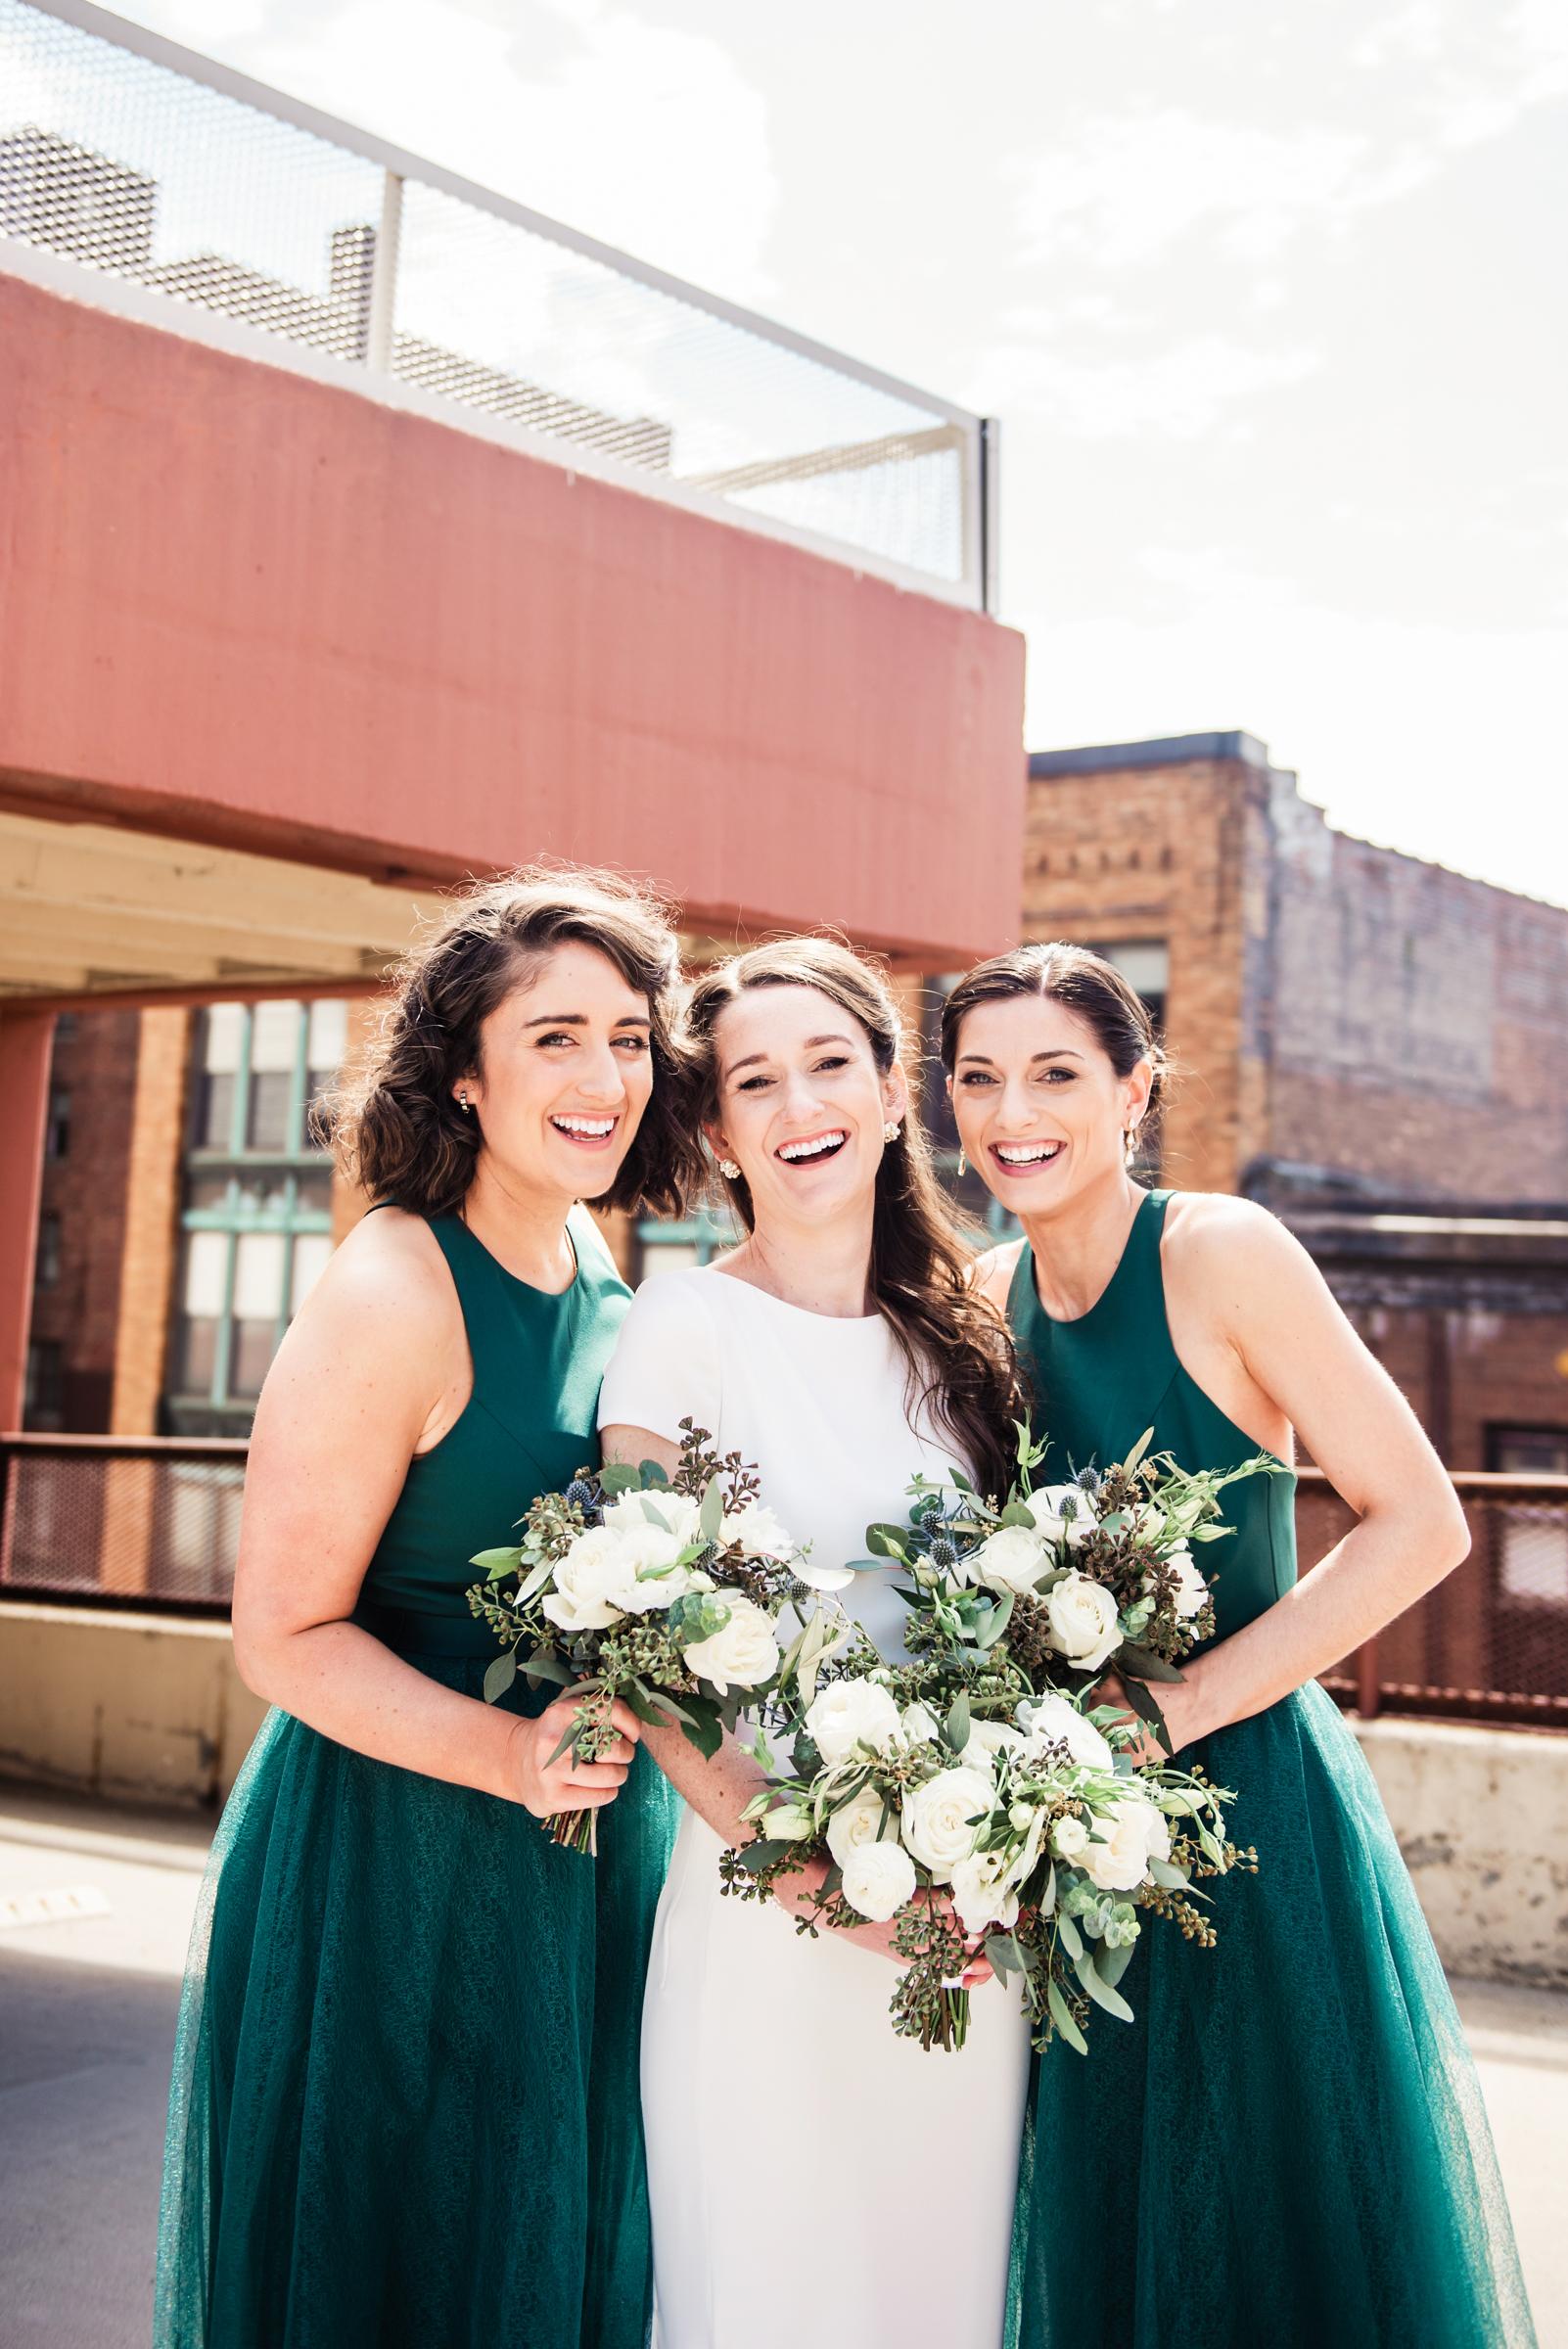 SKY_Armory_Syracuse_Wedding_JILL_STUDIO_Rochester_NY_Photographer_DSC_5525.jpg